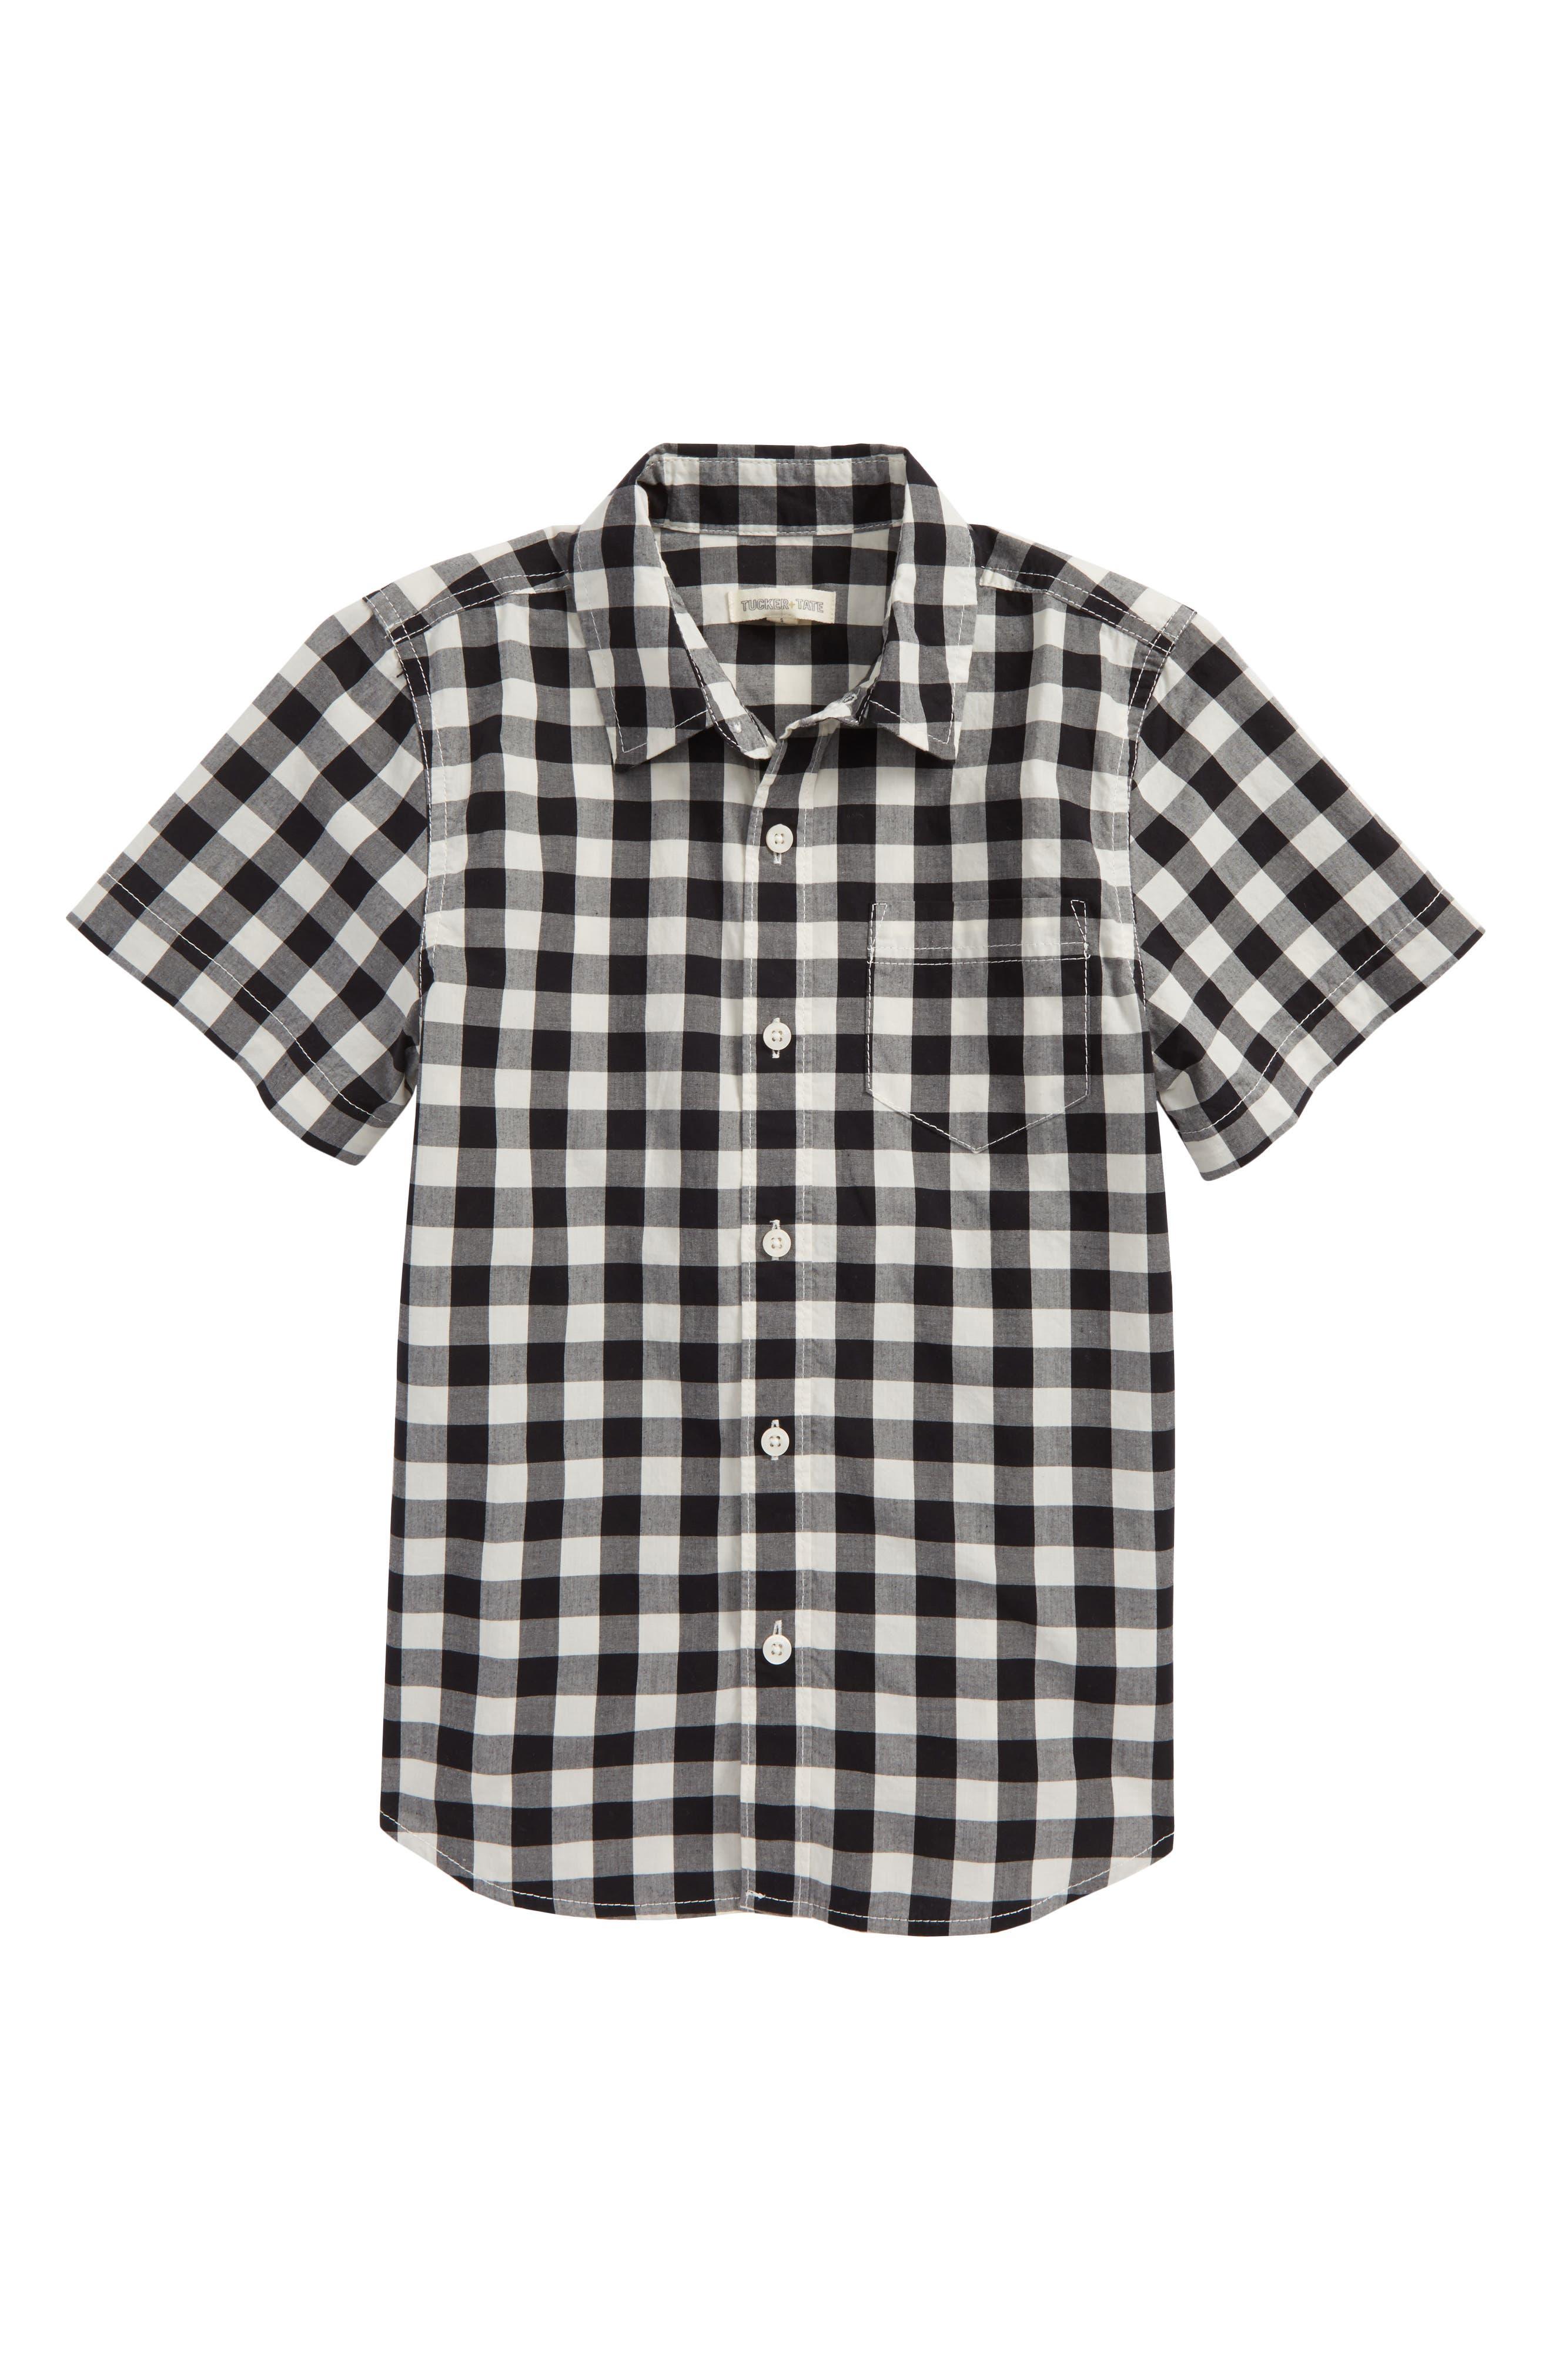 Photo Op Woven Shirt,                             Main thumbnail 1, color,                             Black- Ivory Gingham